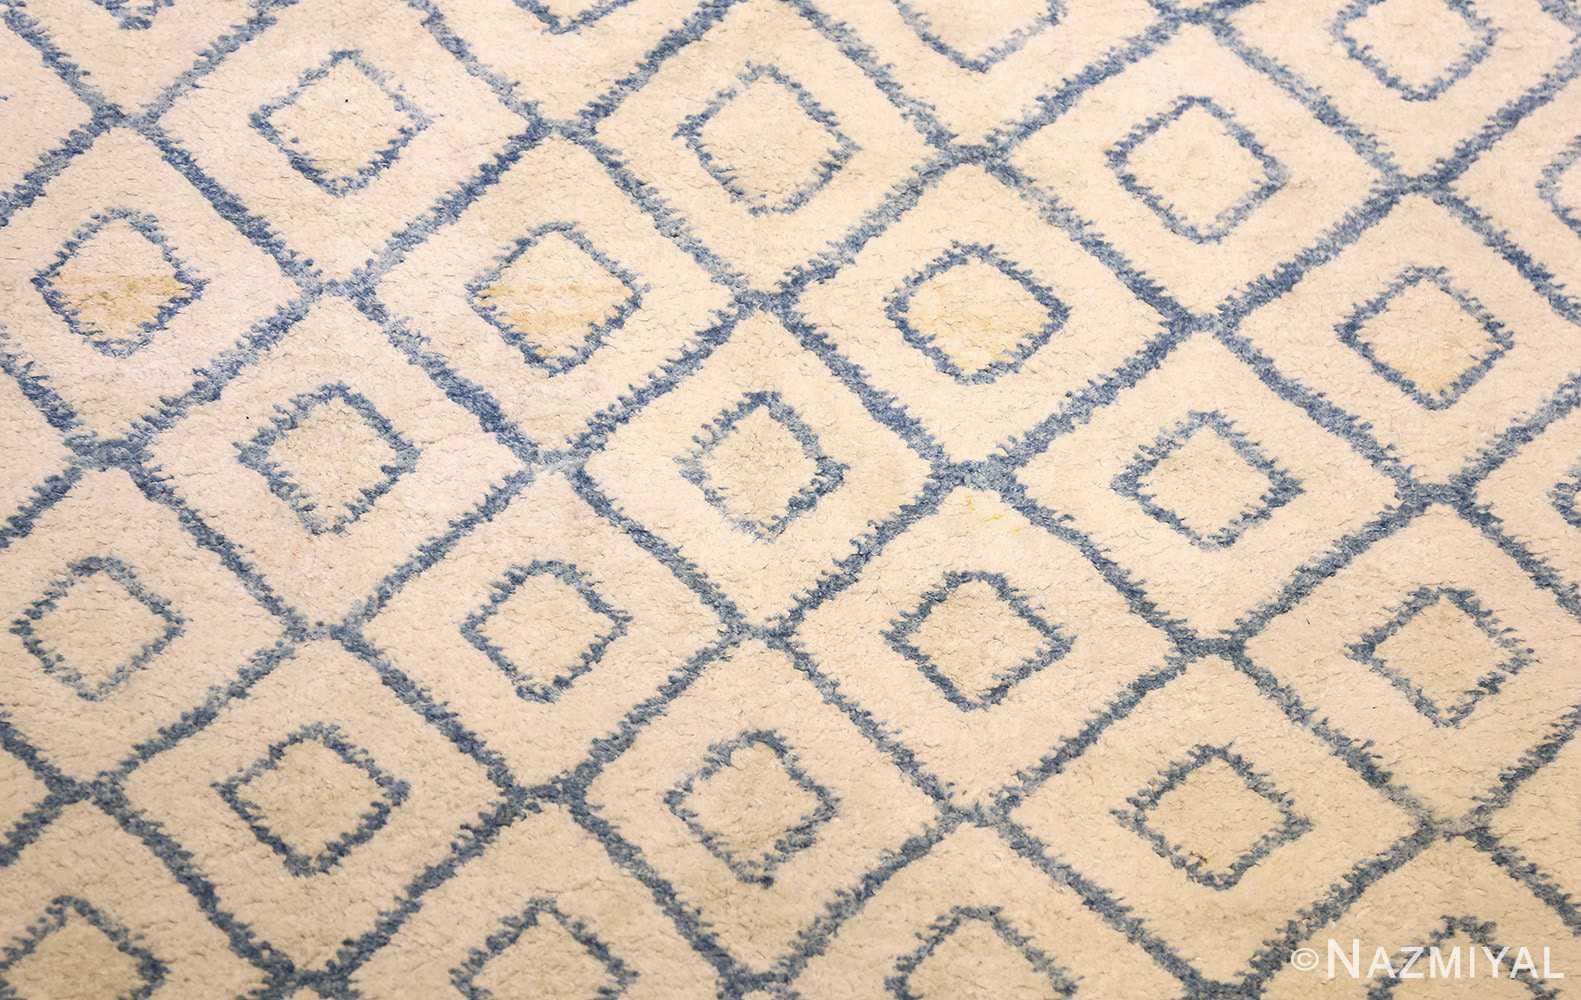 antique cotton indian agra rug 49148 field Nazmiyal